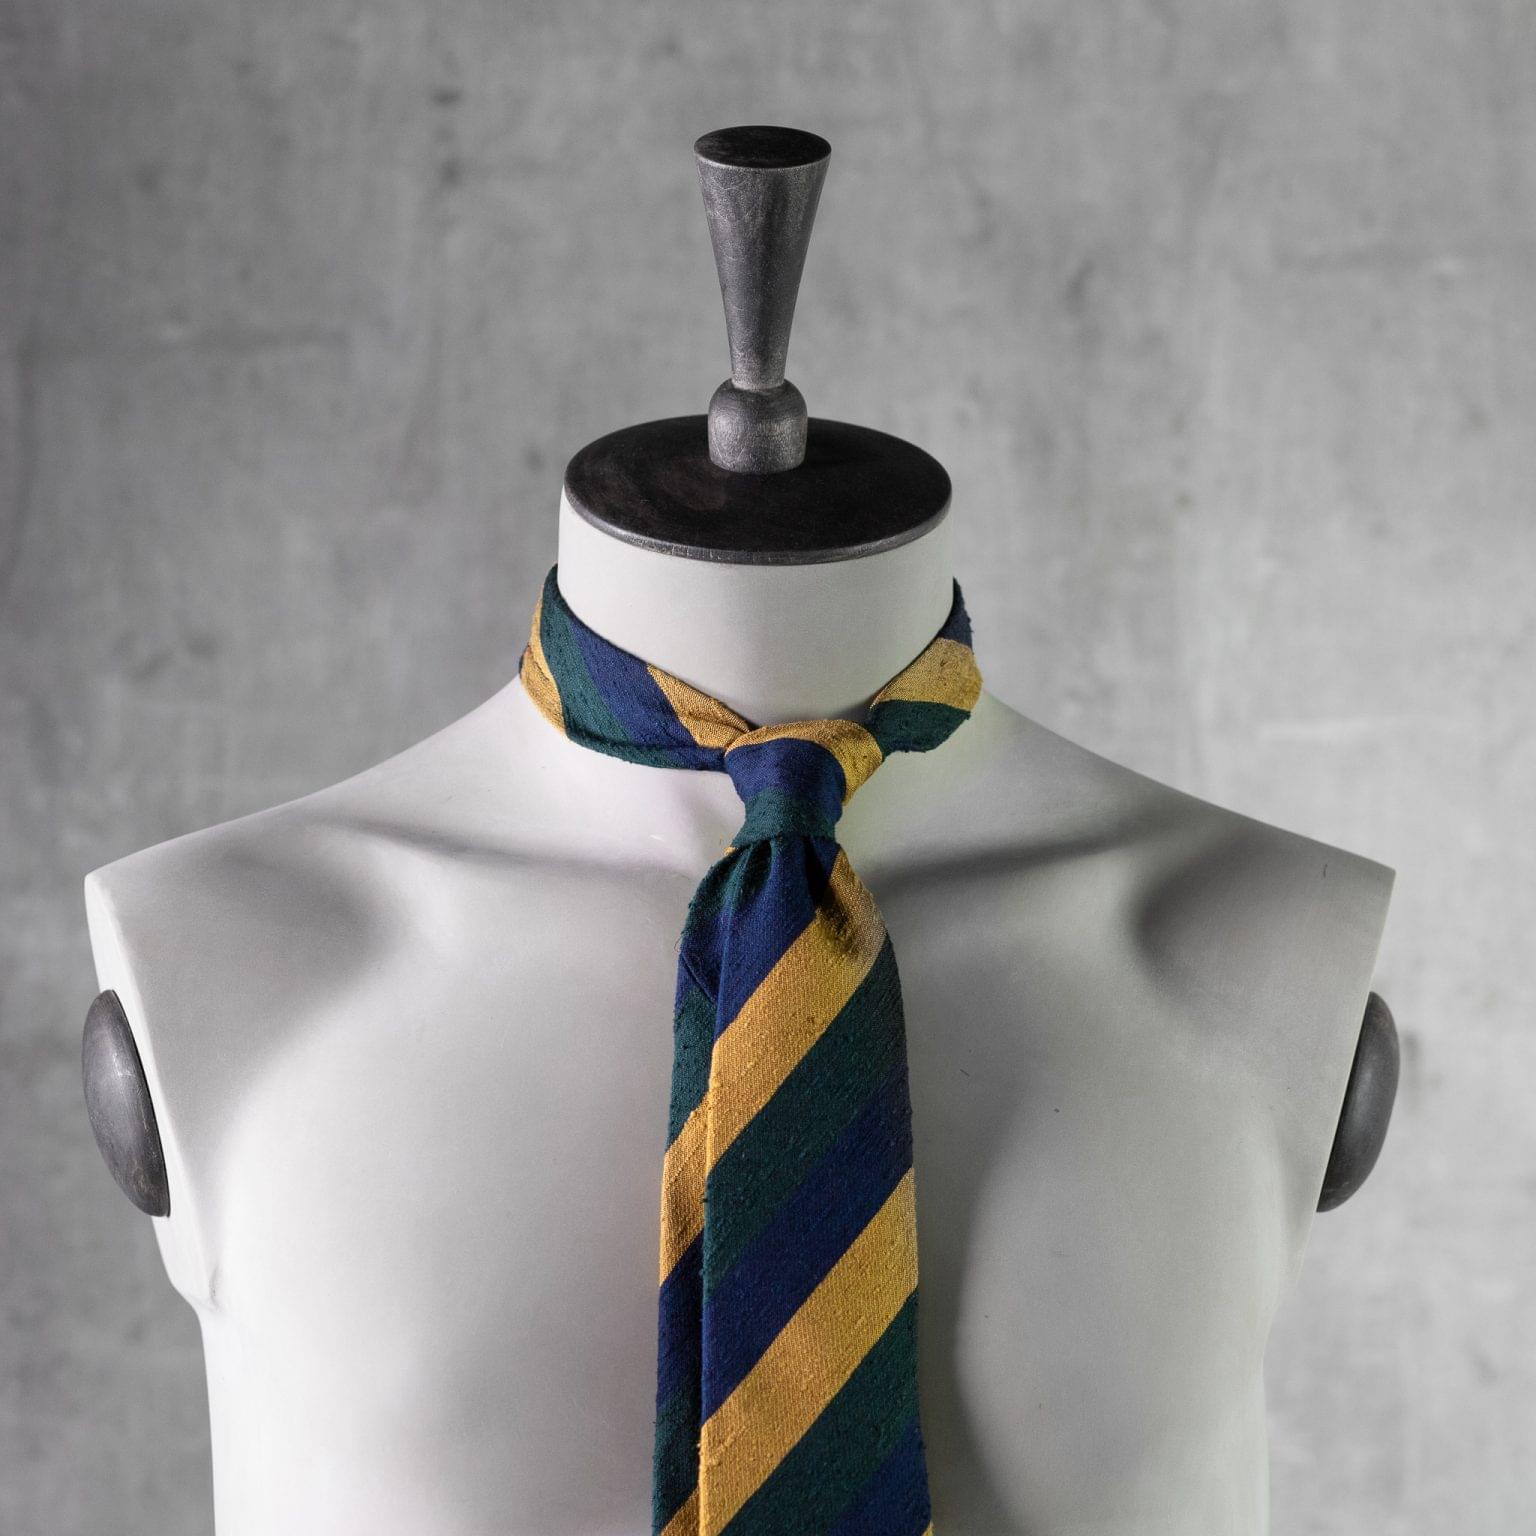 SHANTUNG-0355-Tie-Initials-Corbata-Iniciales-The-Seelk-3